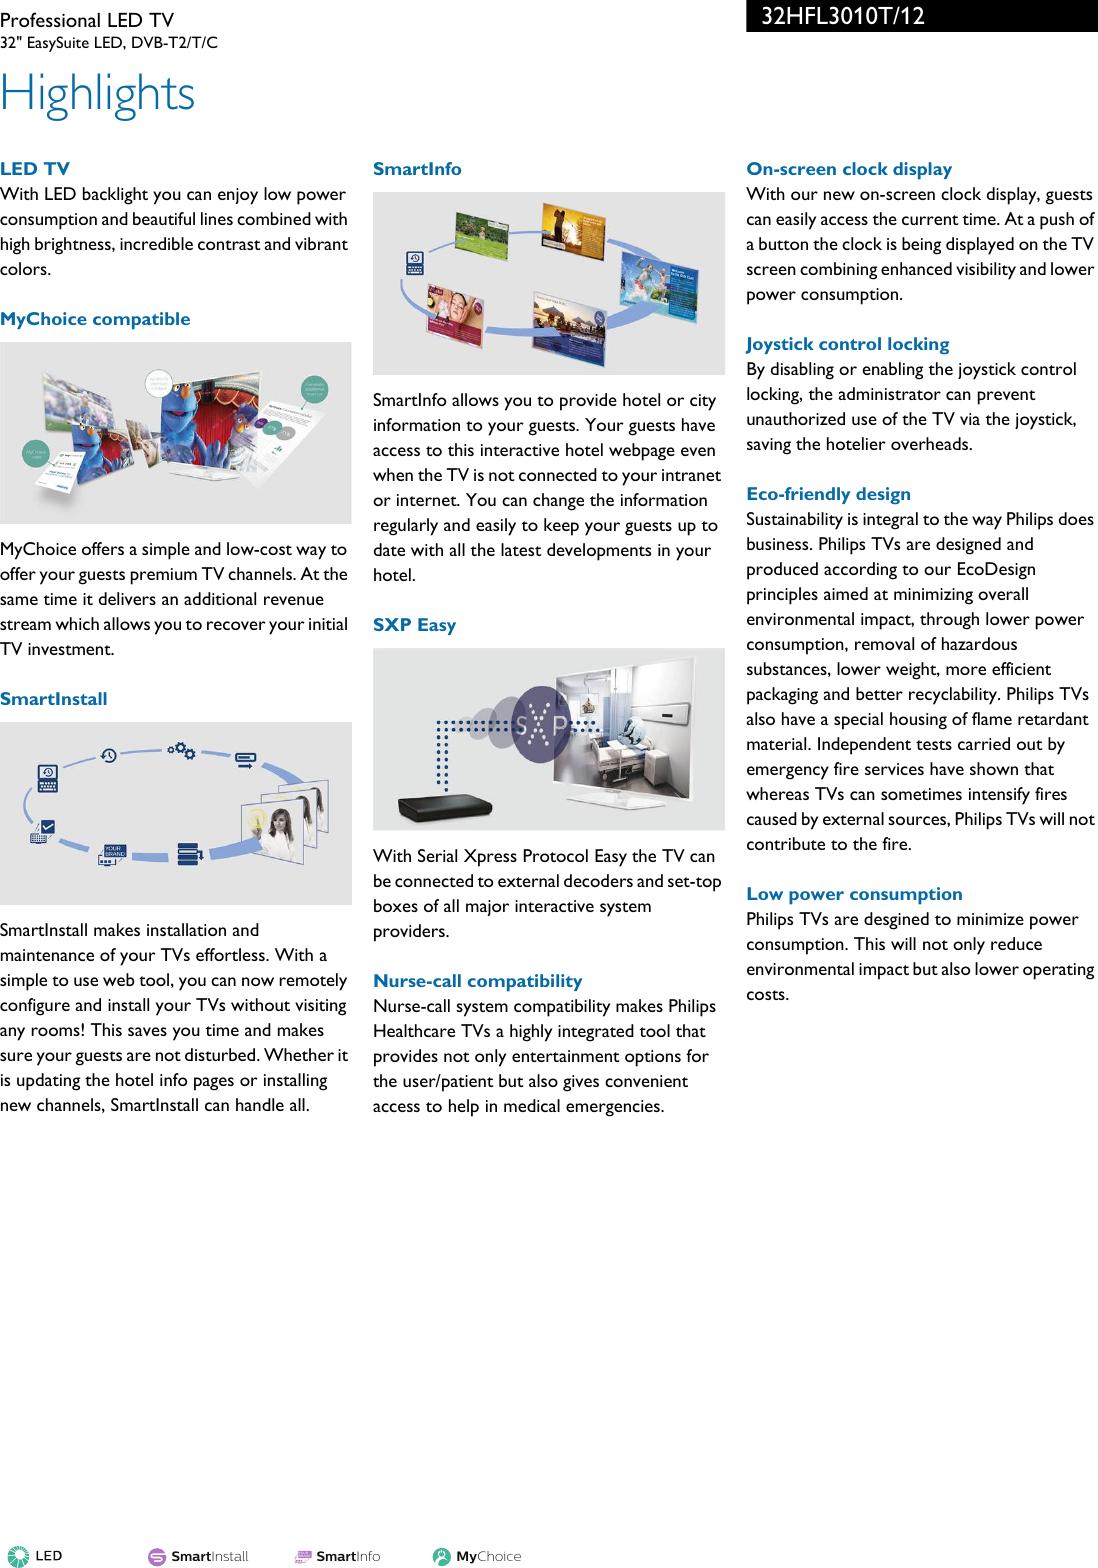 Philips 32HFL3010T/12 Professional LED TV User Manual